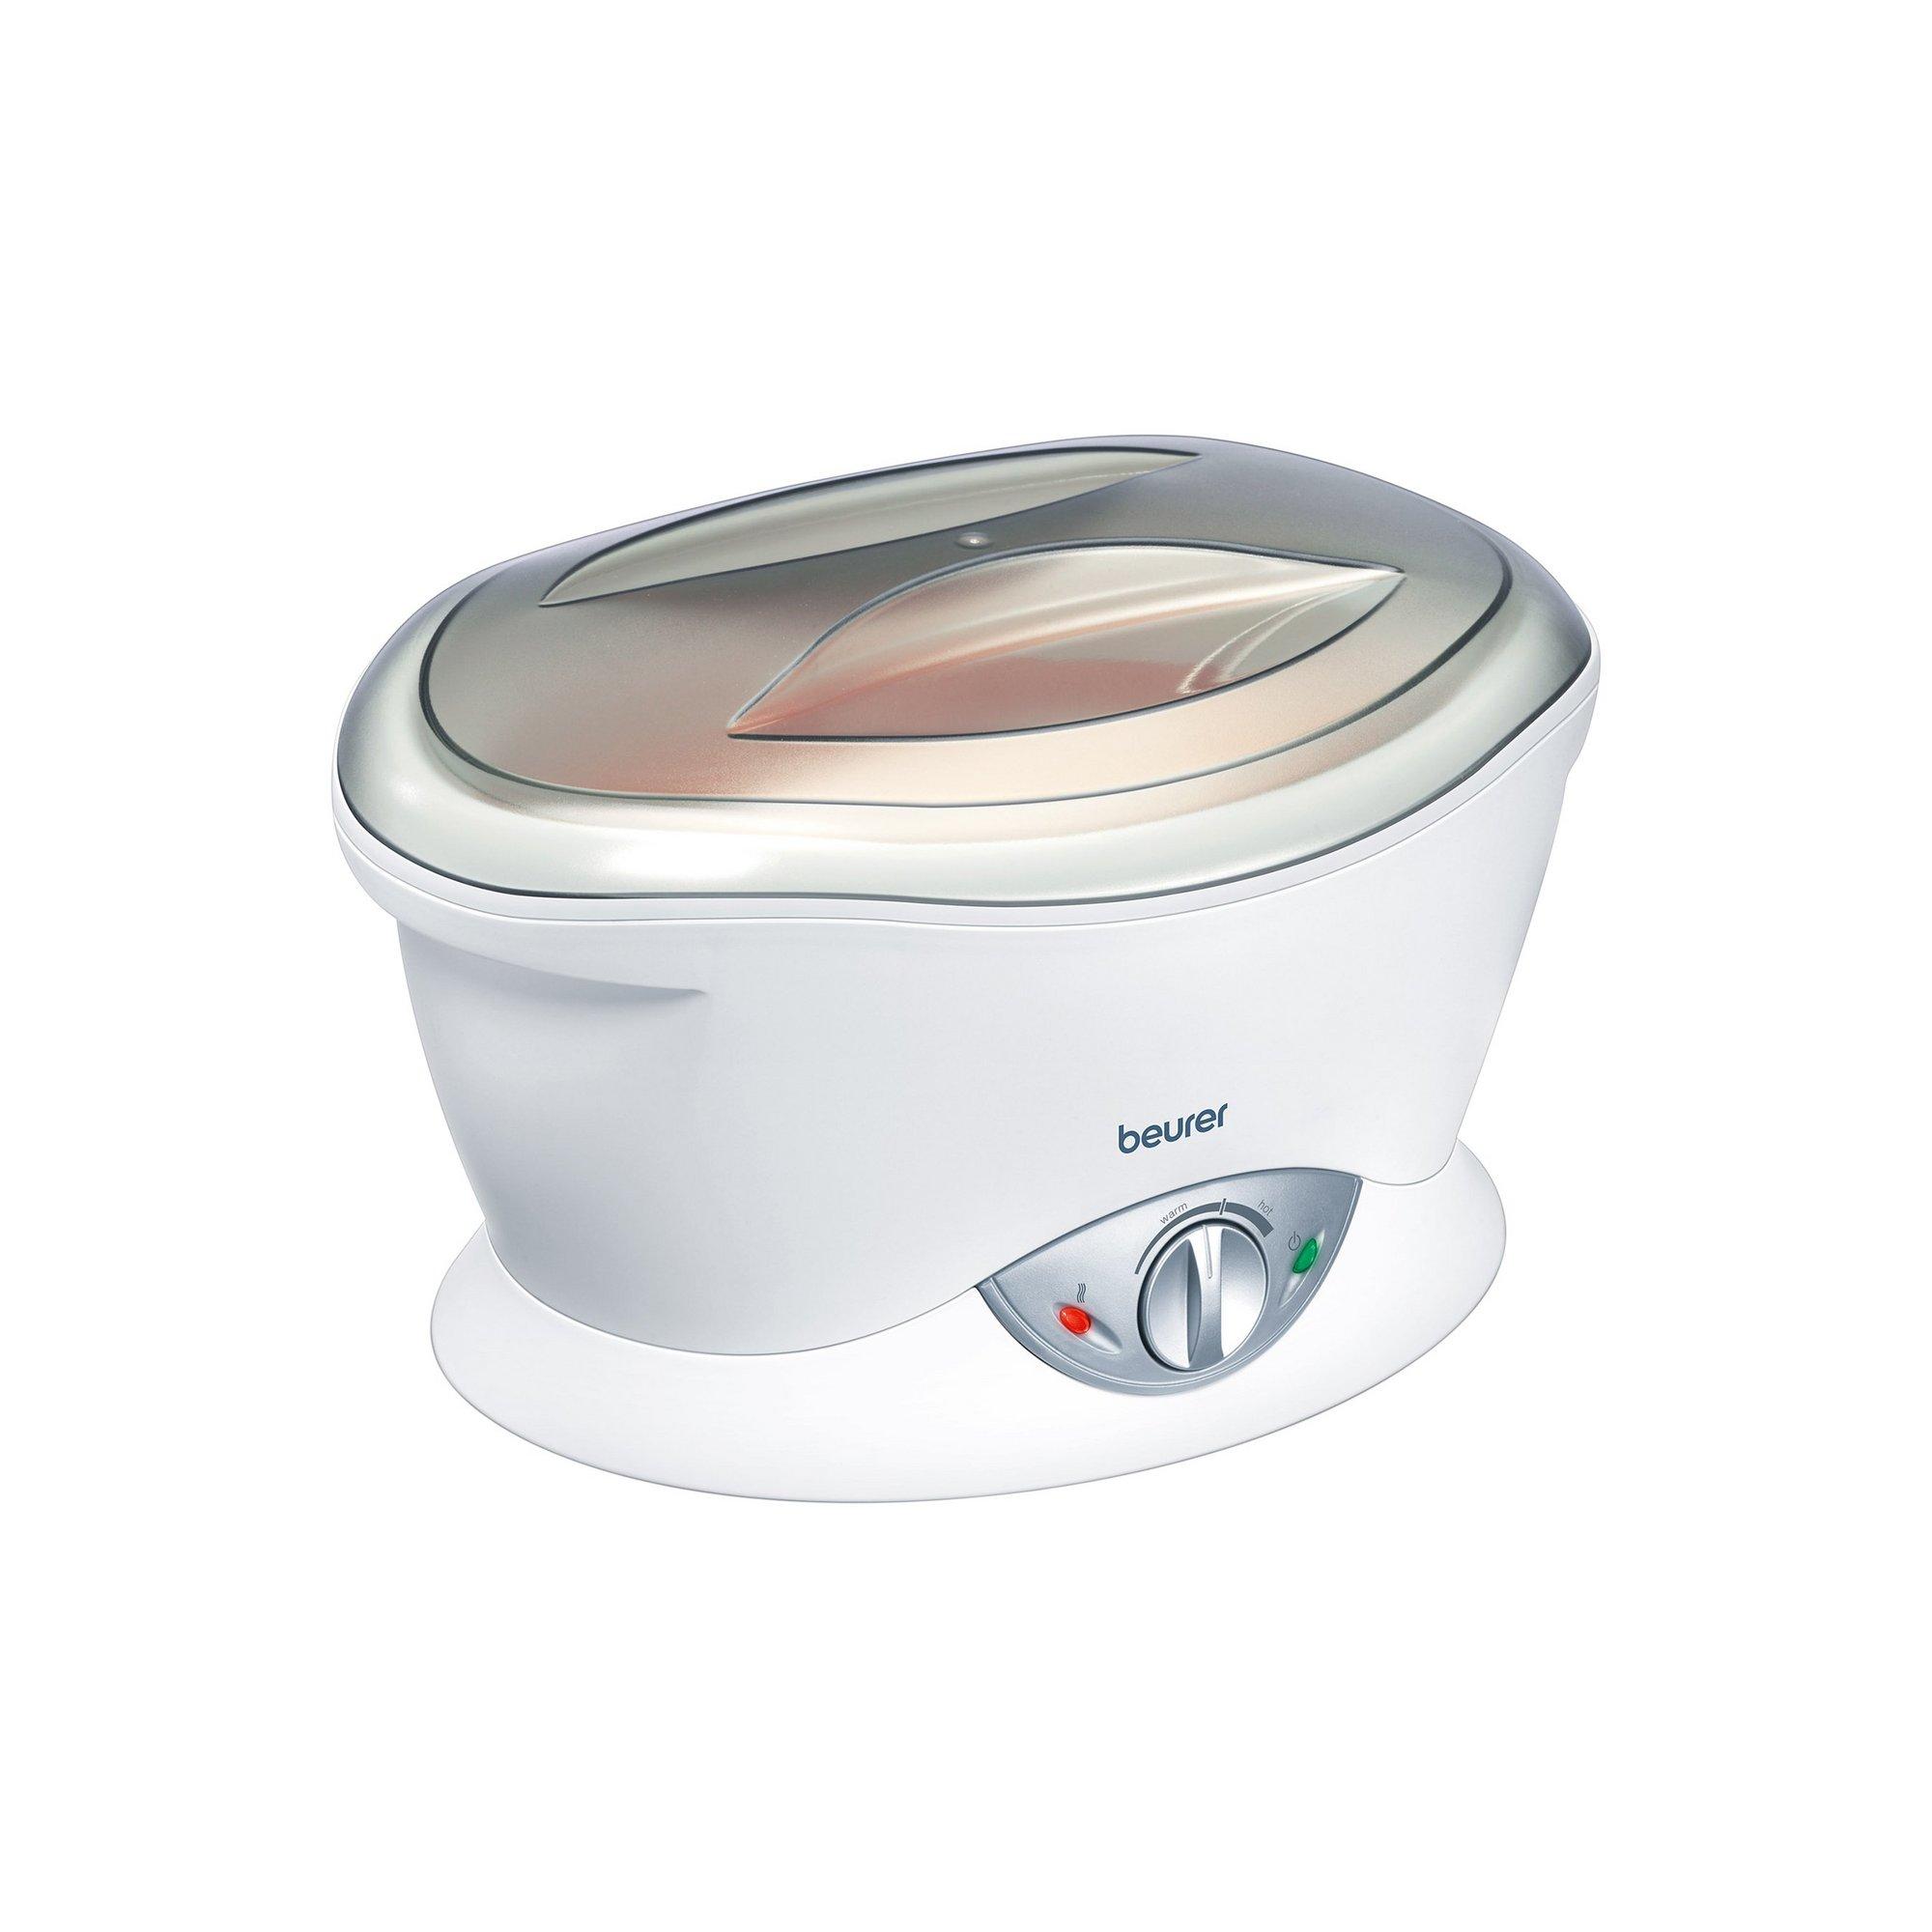 Image of Beurer MP70 Paraffin Wax Bath